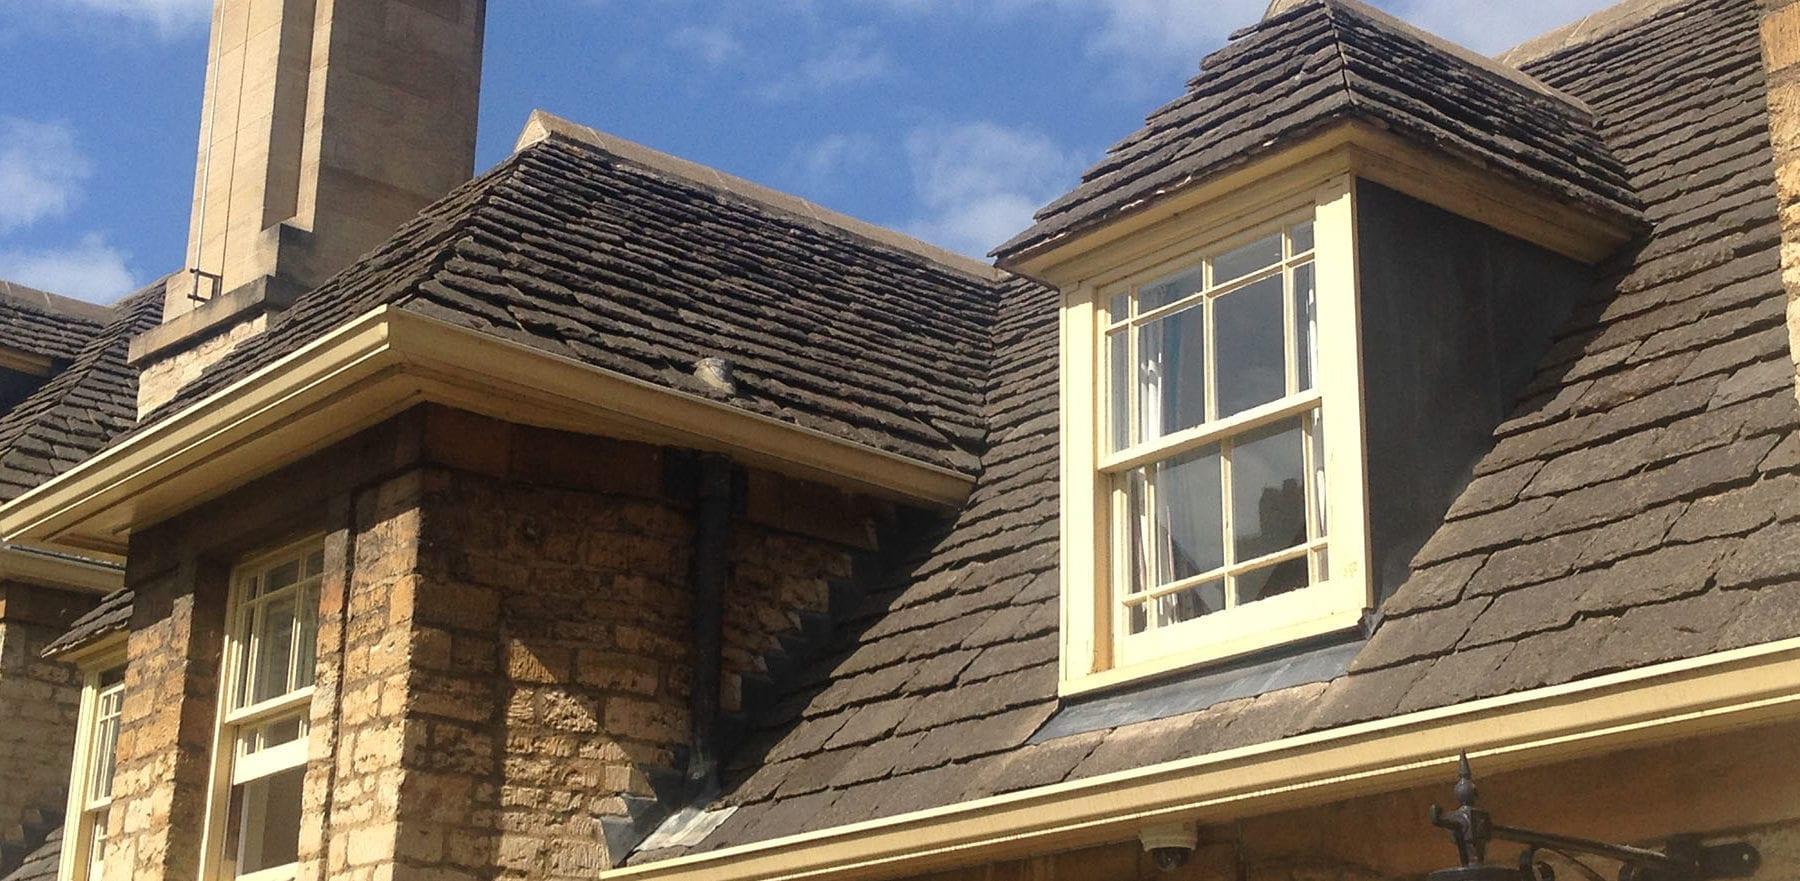 Lifestiles - Natural Stone Aged Roof Tiles - Oxford University, England